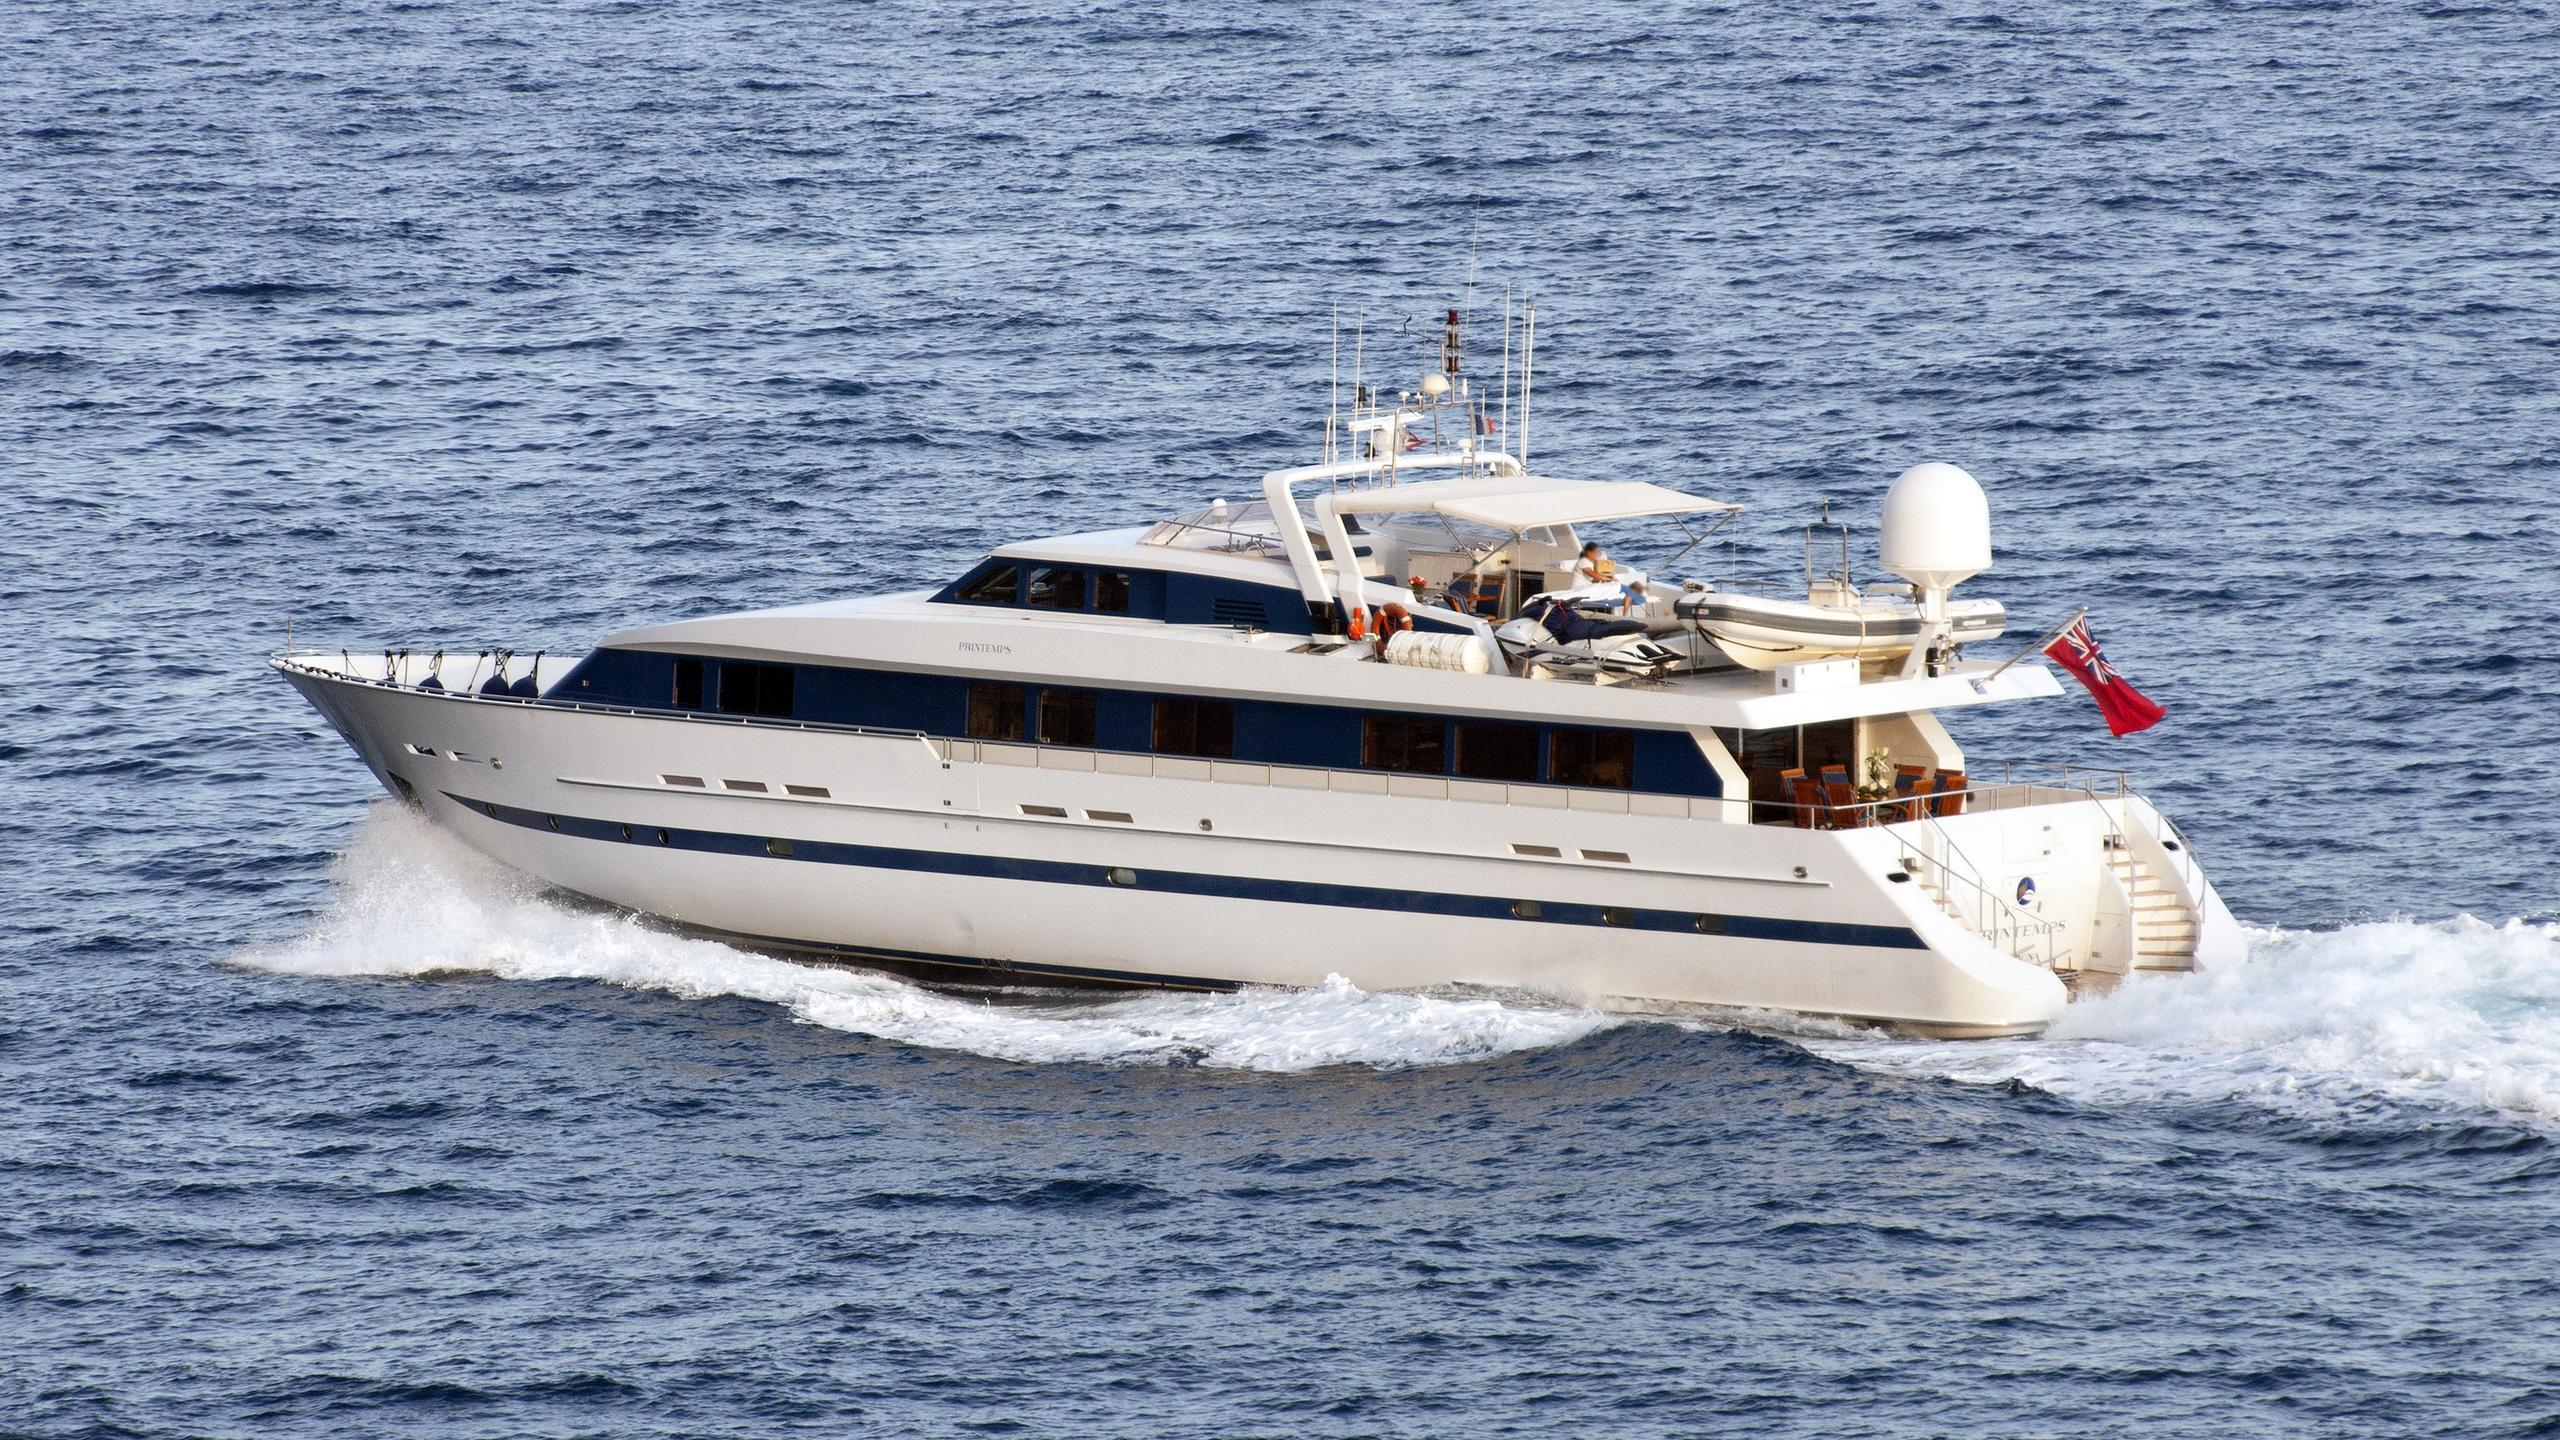 printemps-motor-yacht-heesen1987-34m-cruising-half-profile